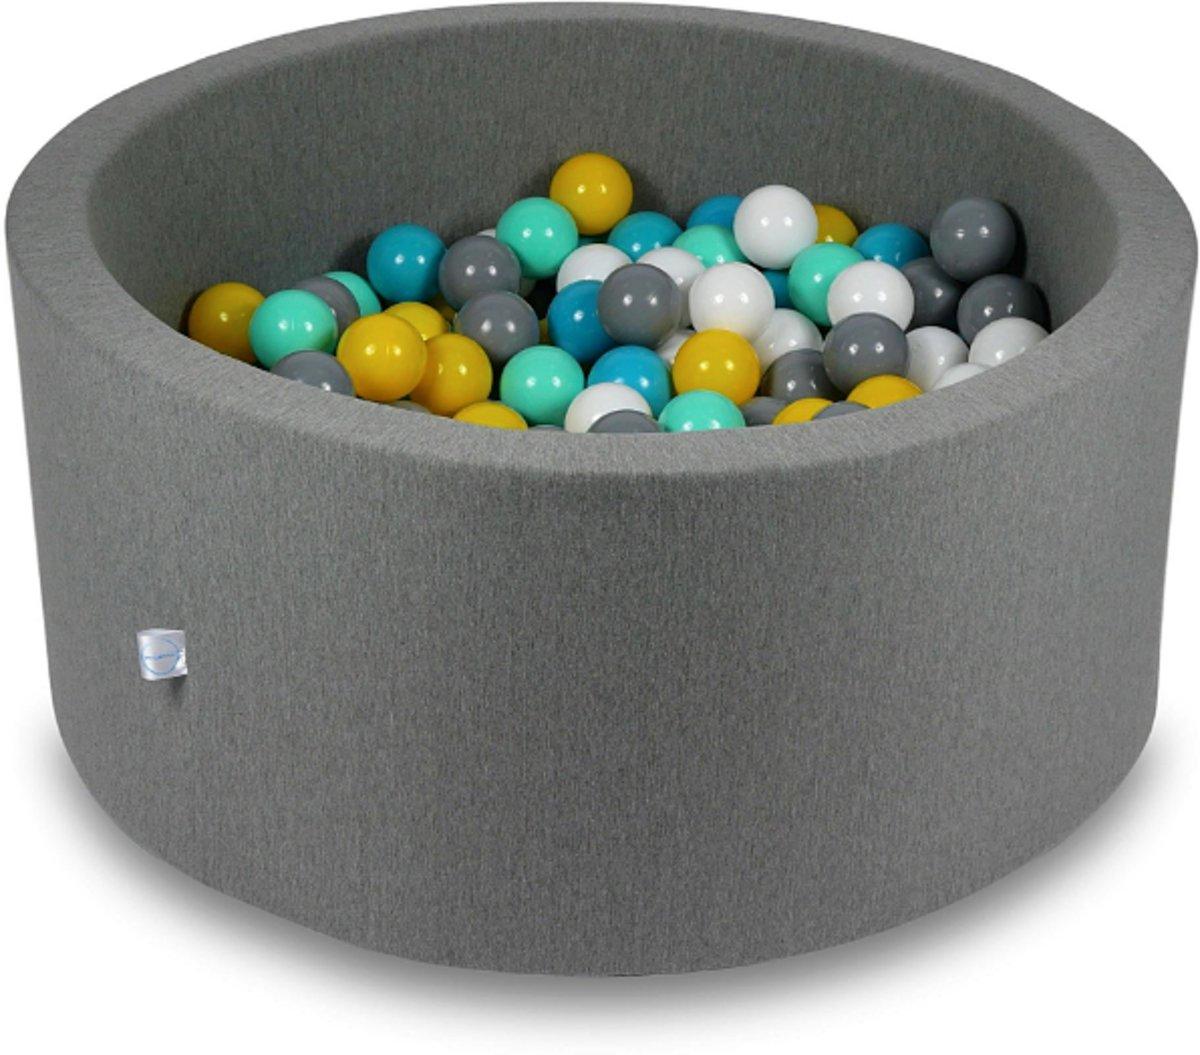 Ballenbak - 300 ballen - 90 x 40 cm - ballenbad - rond donker grijs